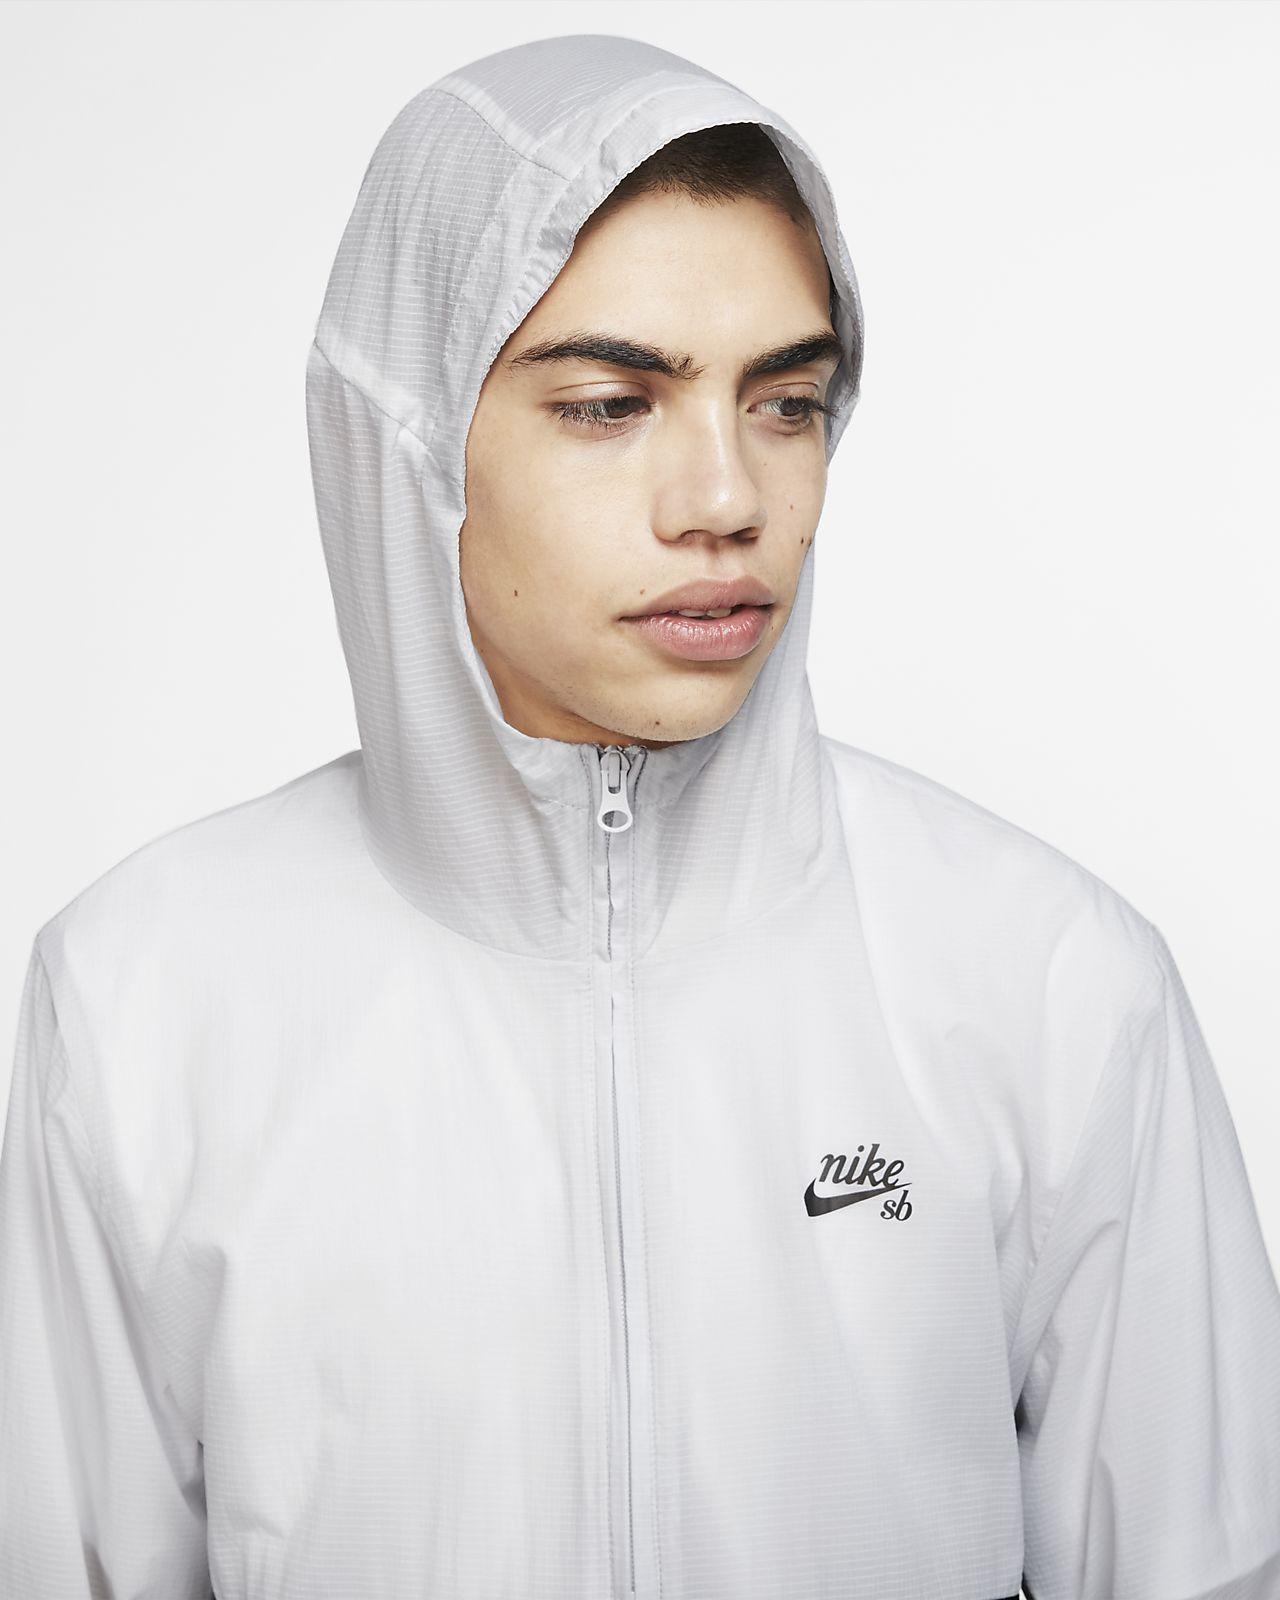 detailing shades of new release Nike SB Skate Anorak Jacket